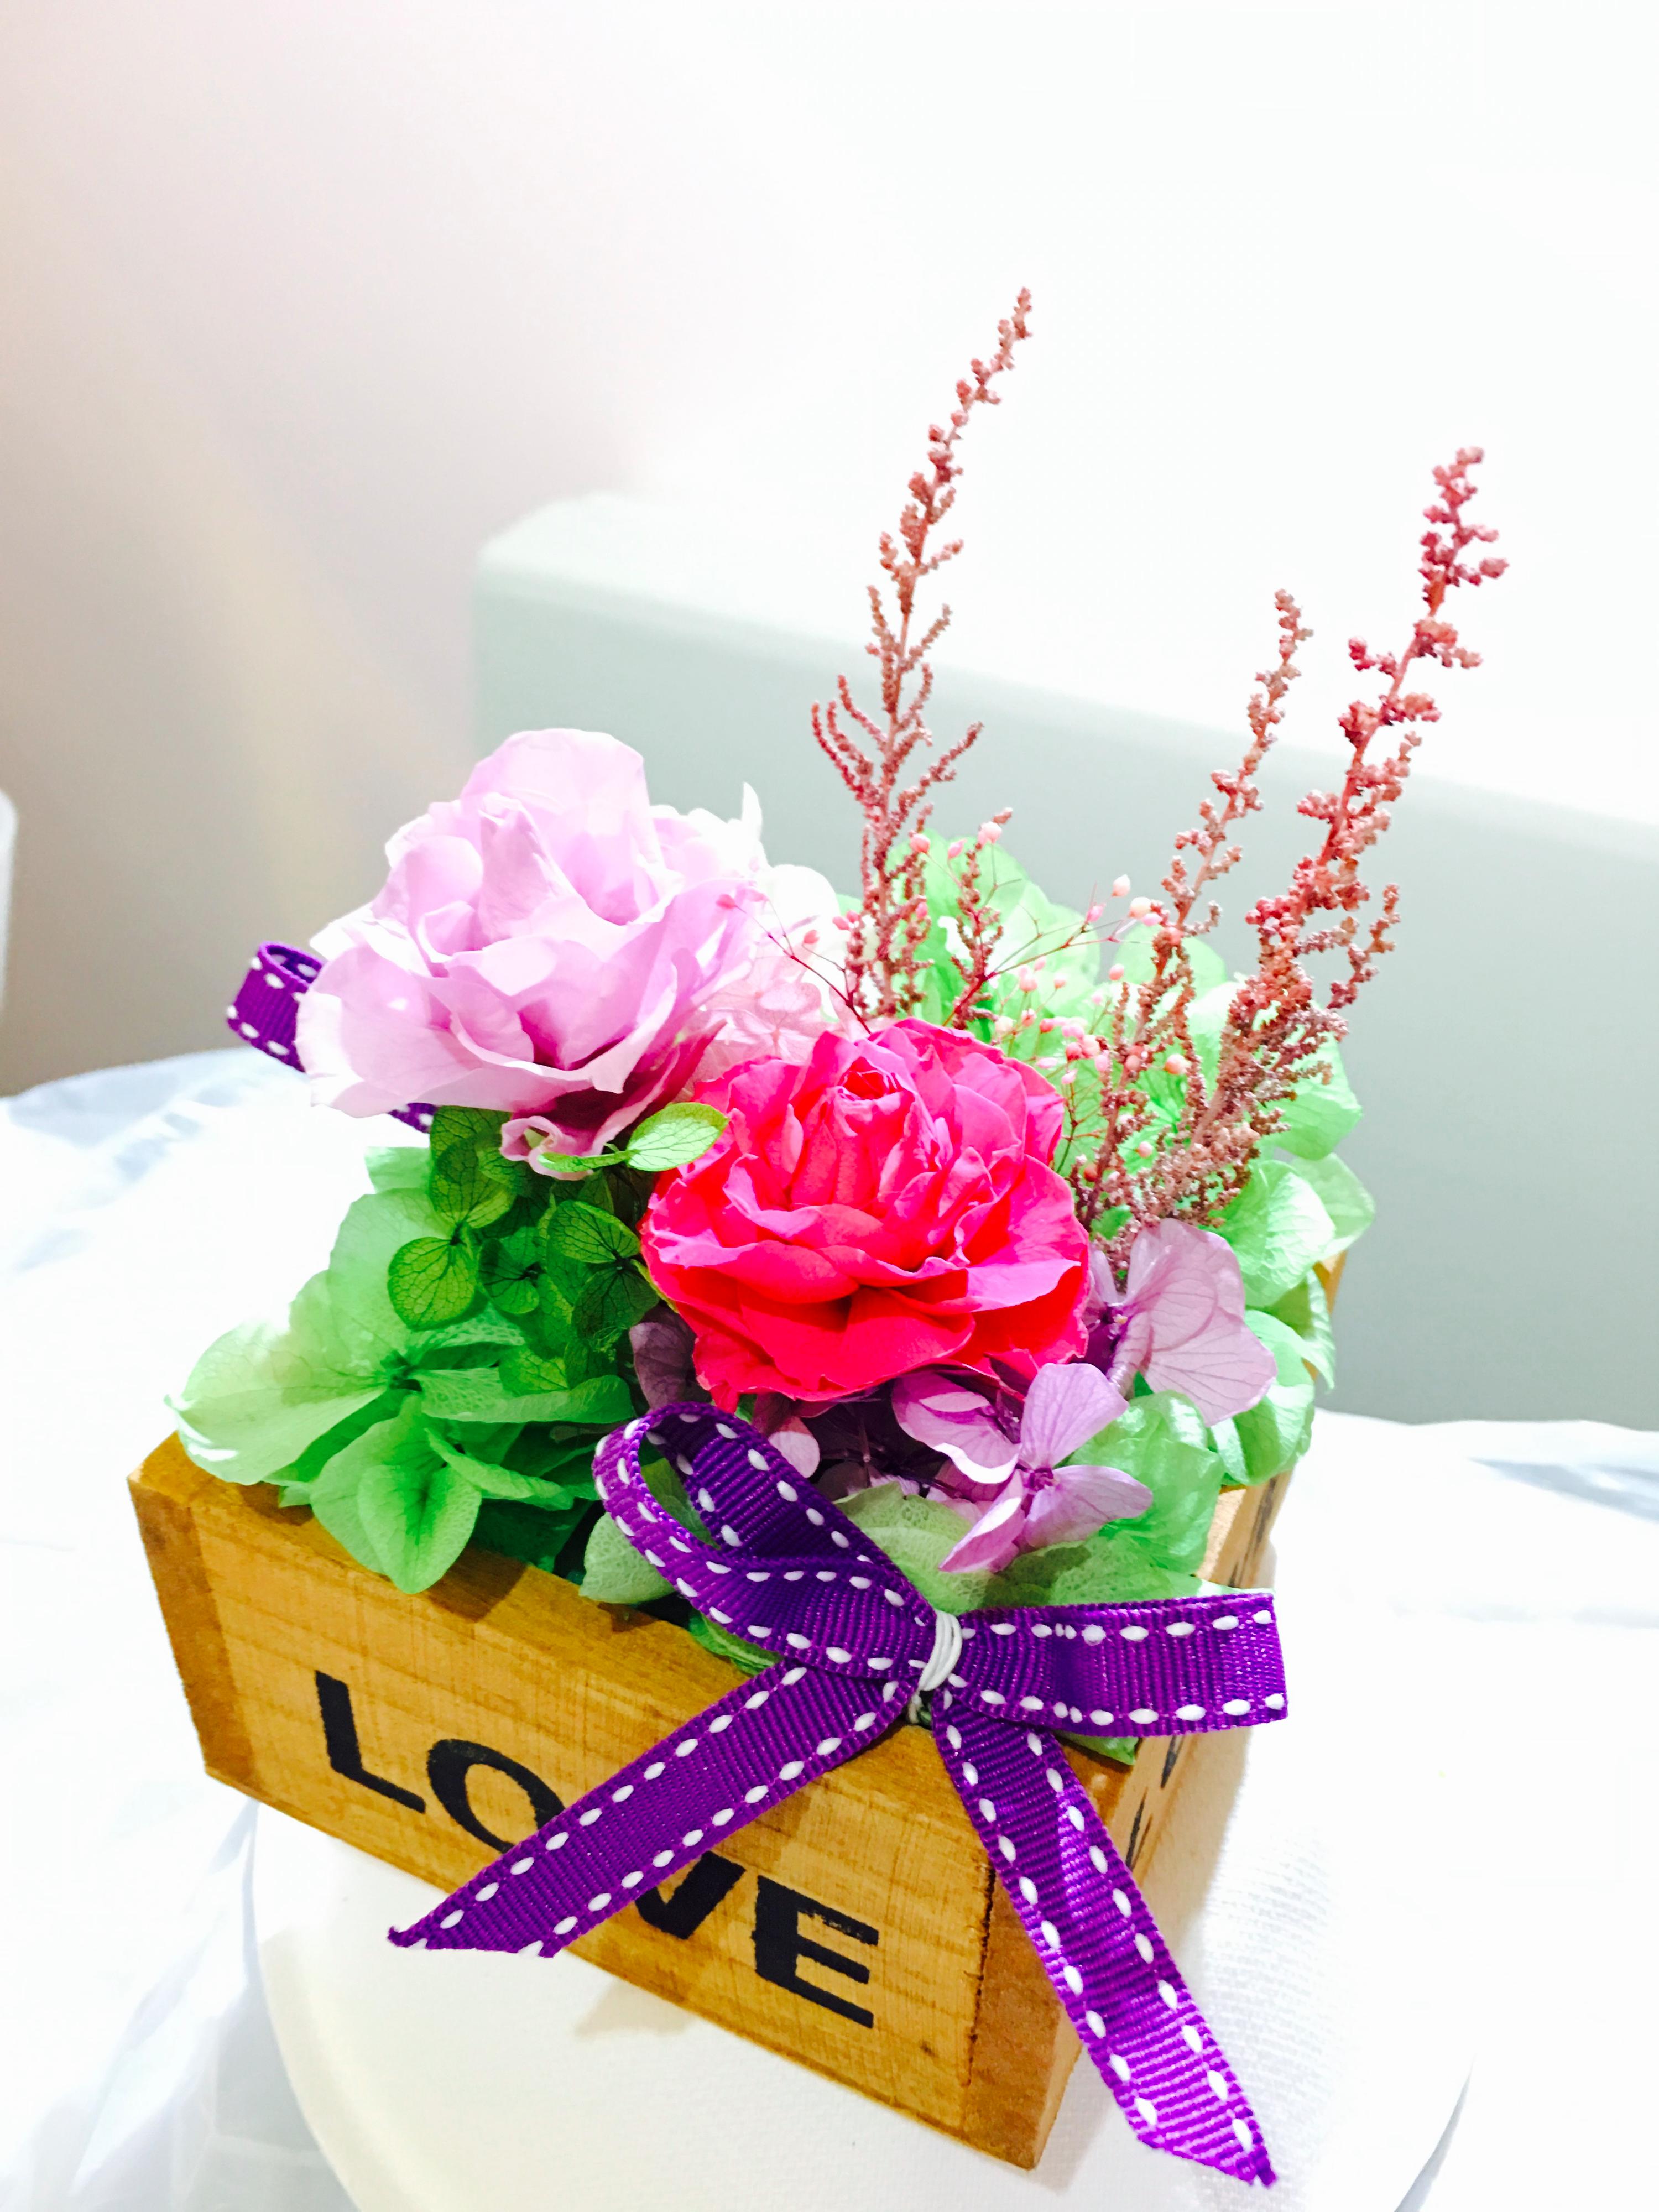 玫瑰love小木盤作品-PF113